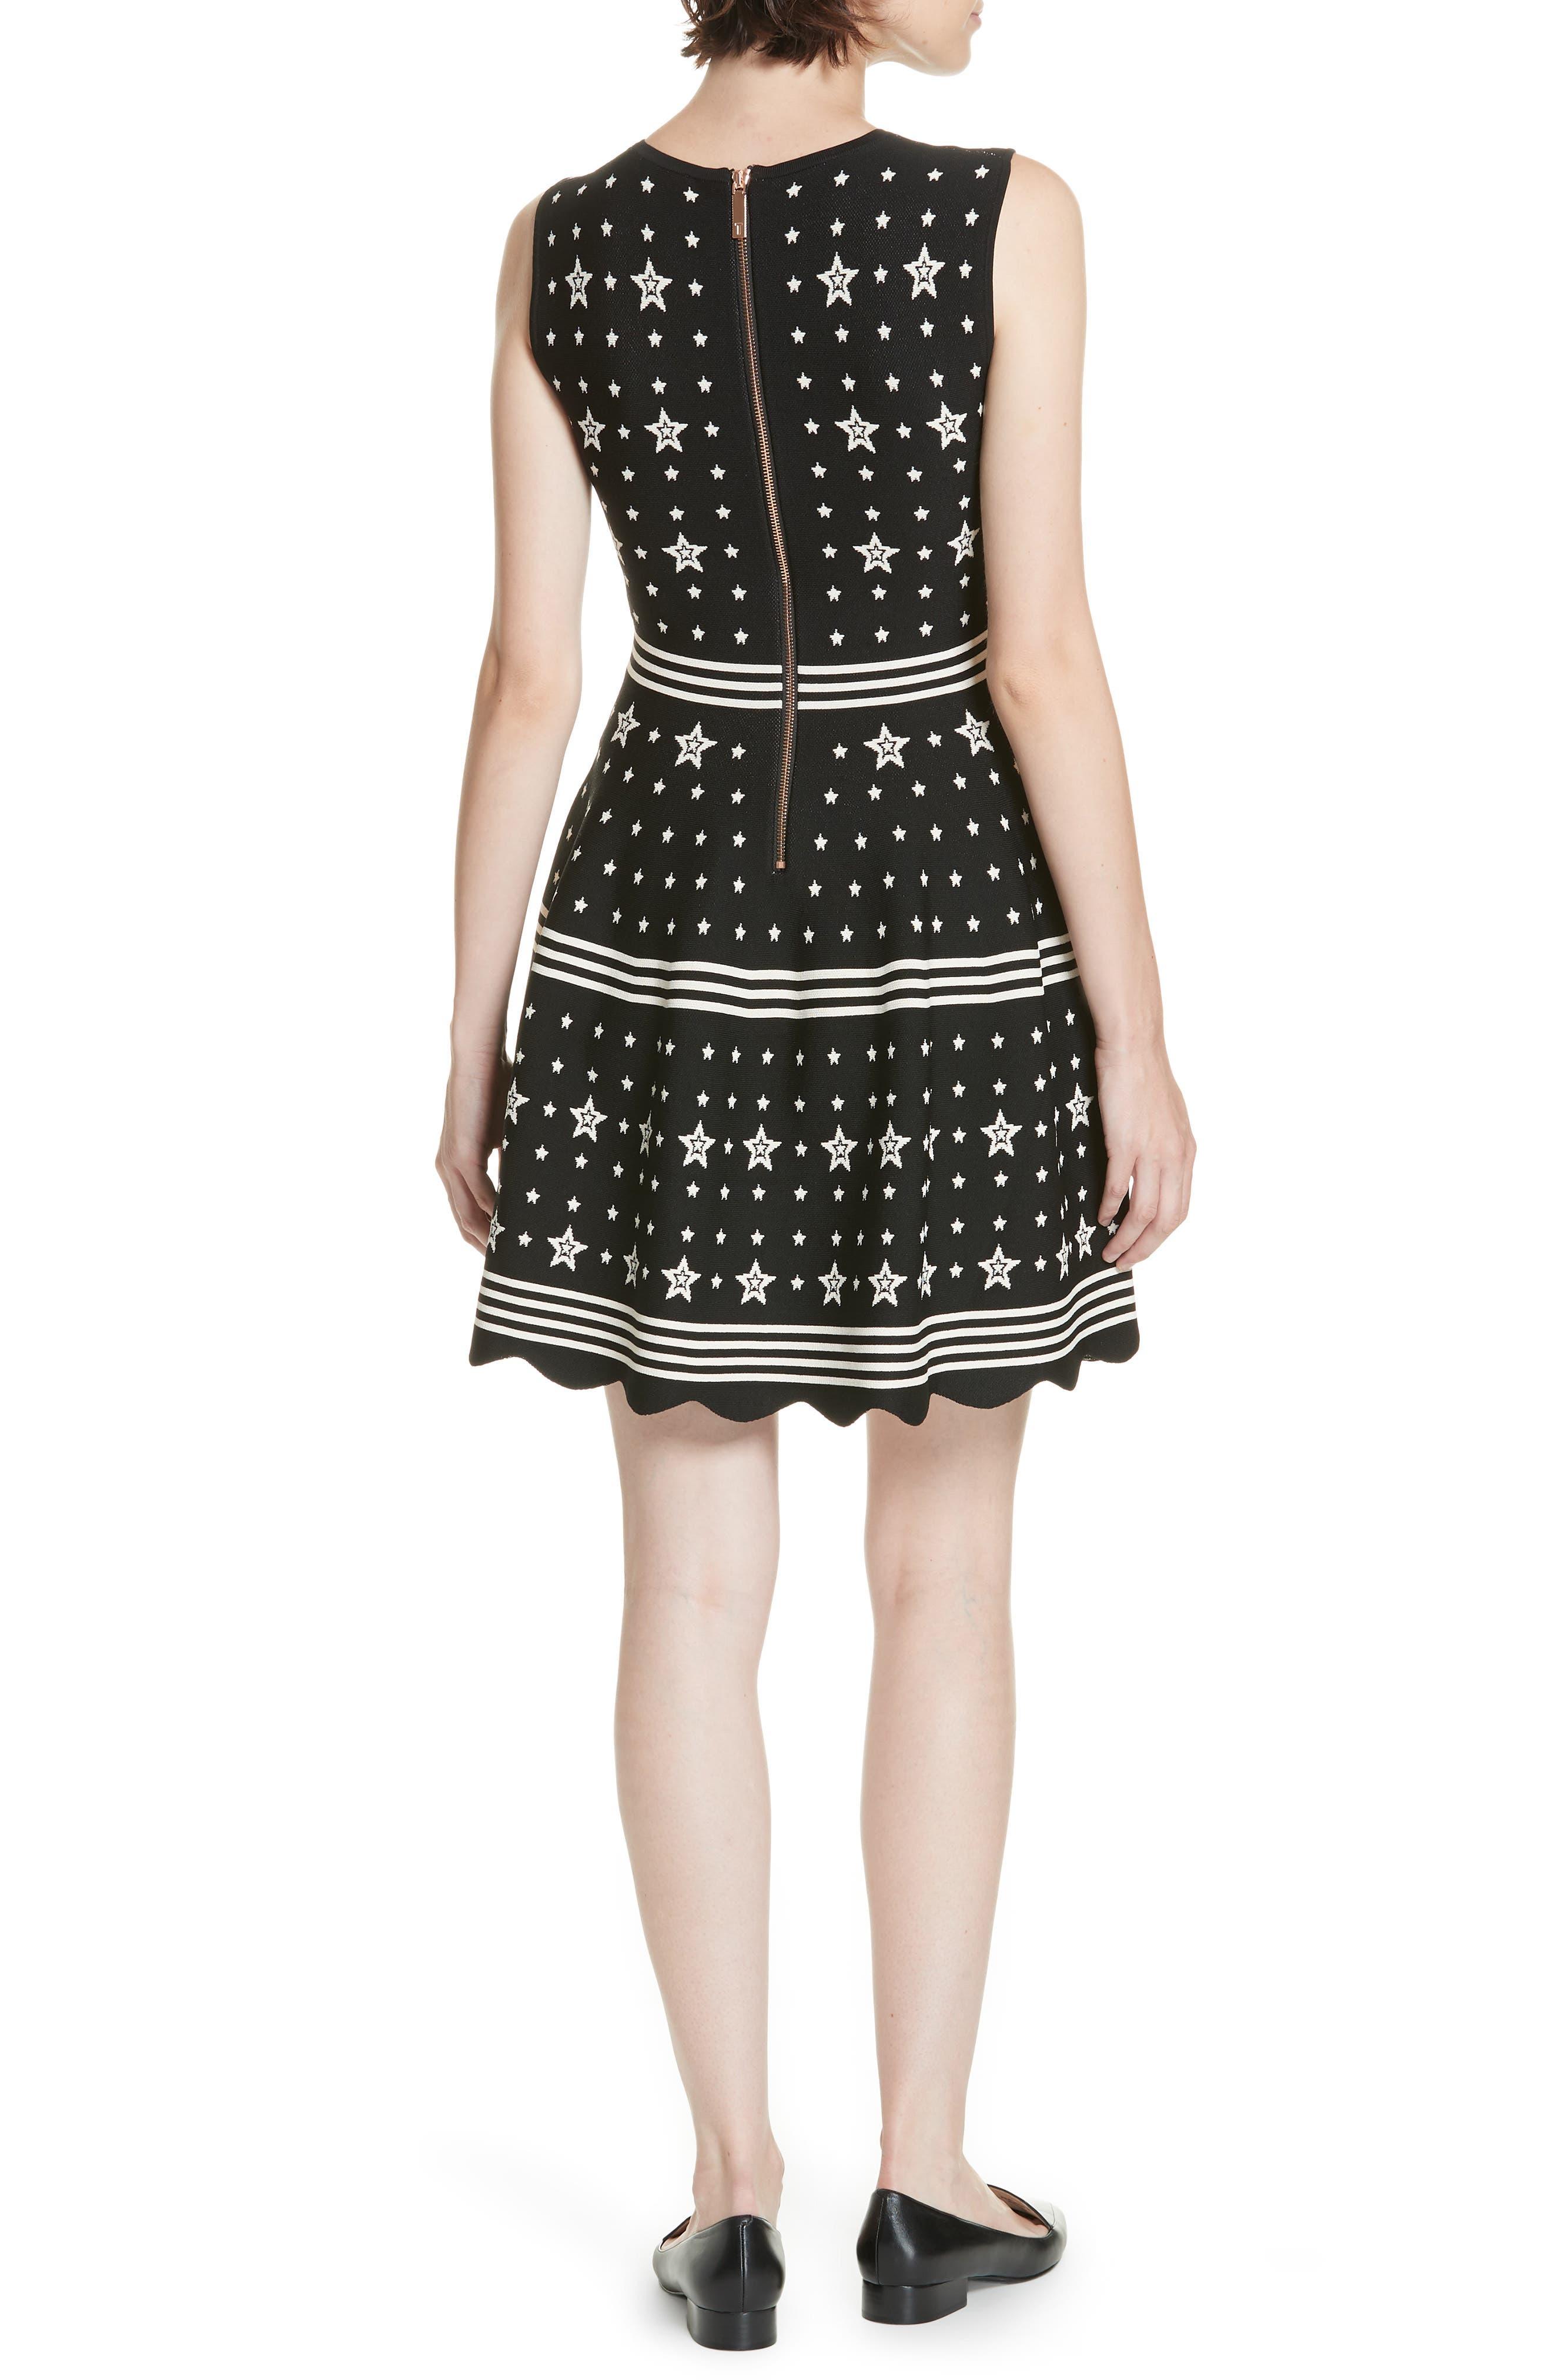 Mariae Star Dress,                             Alternate thumbnail 2, color,                             001